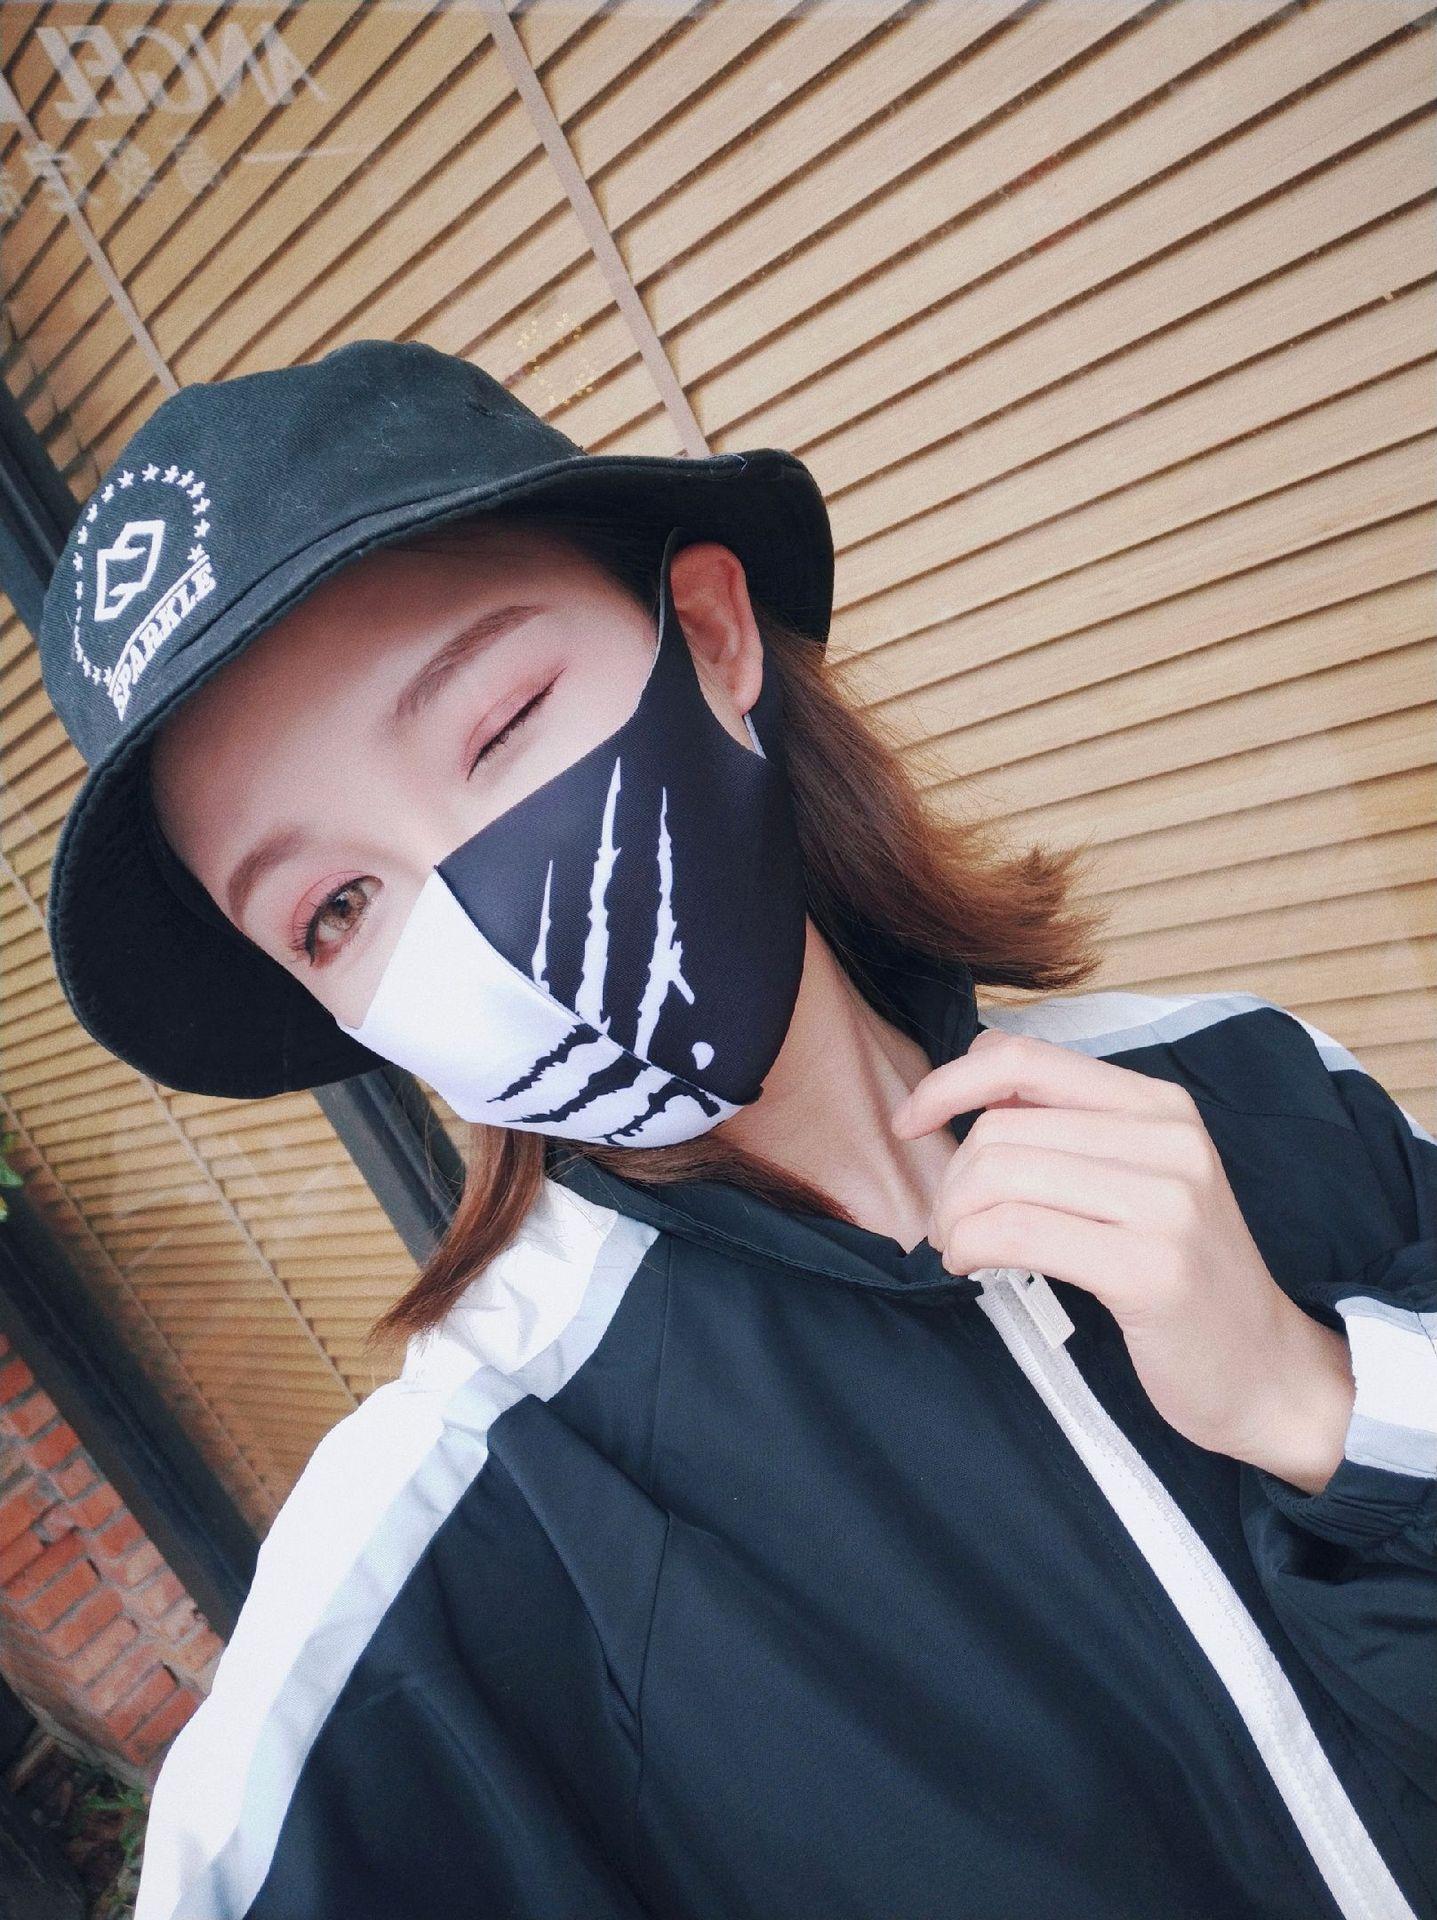 2020 Style Sponge Face Mask Black Breathable Mouth Mask Reusable Anti Pollution Face Shield Wind Proof Unisex Sponge Face Mask